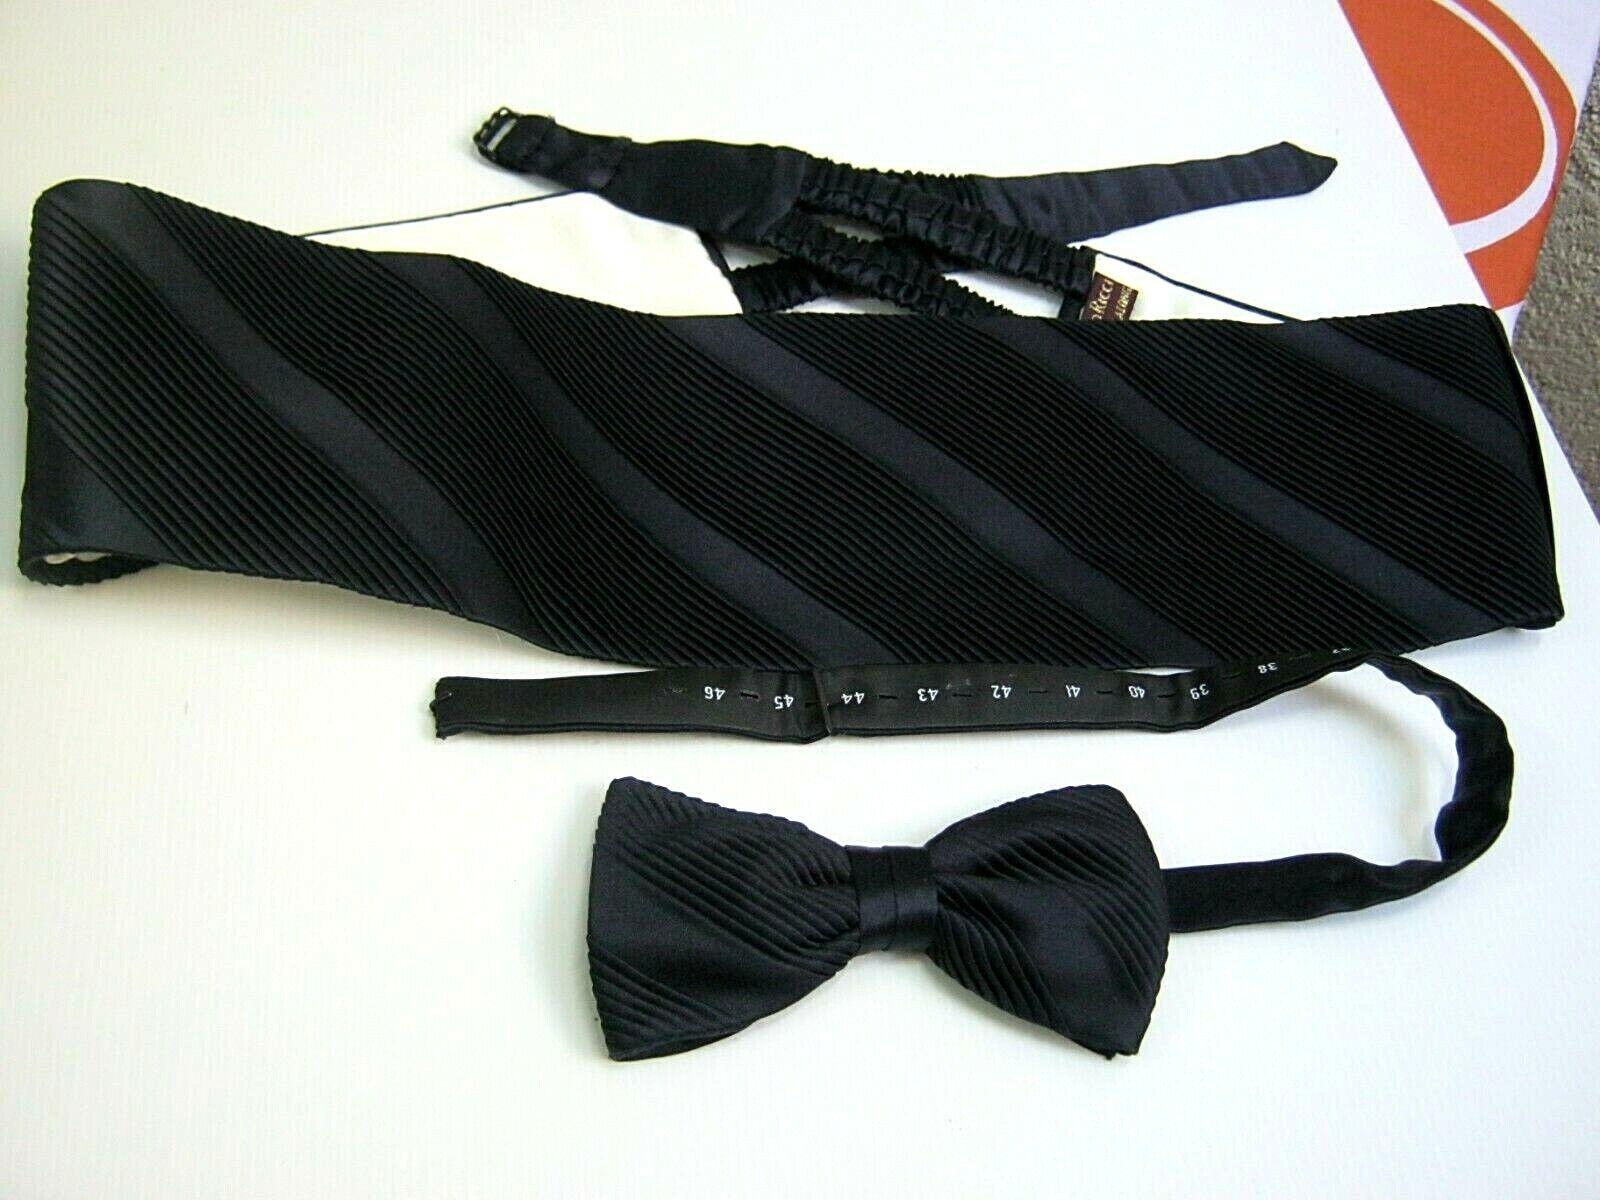 STEFANO RICCI New Statement Band Bow-Tie XL Ceremony Silk